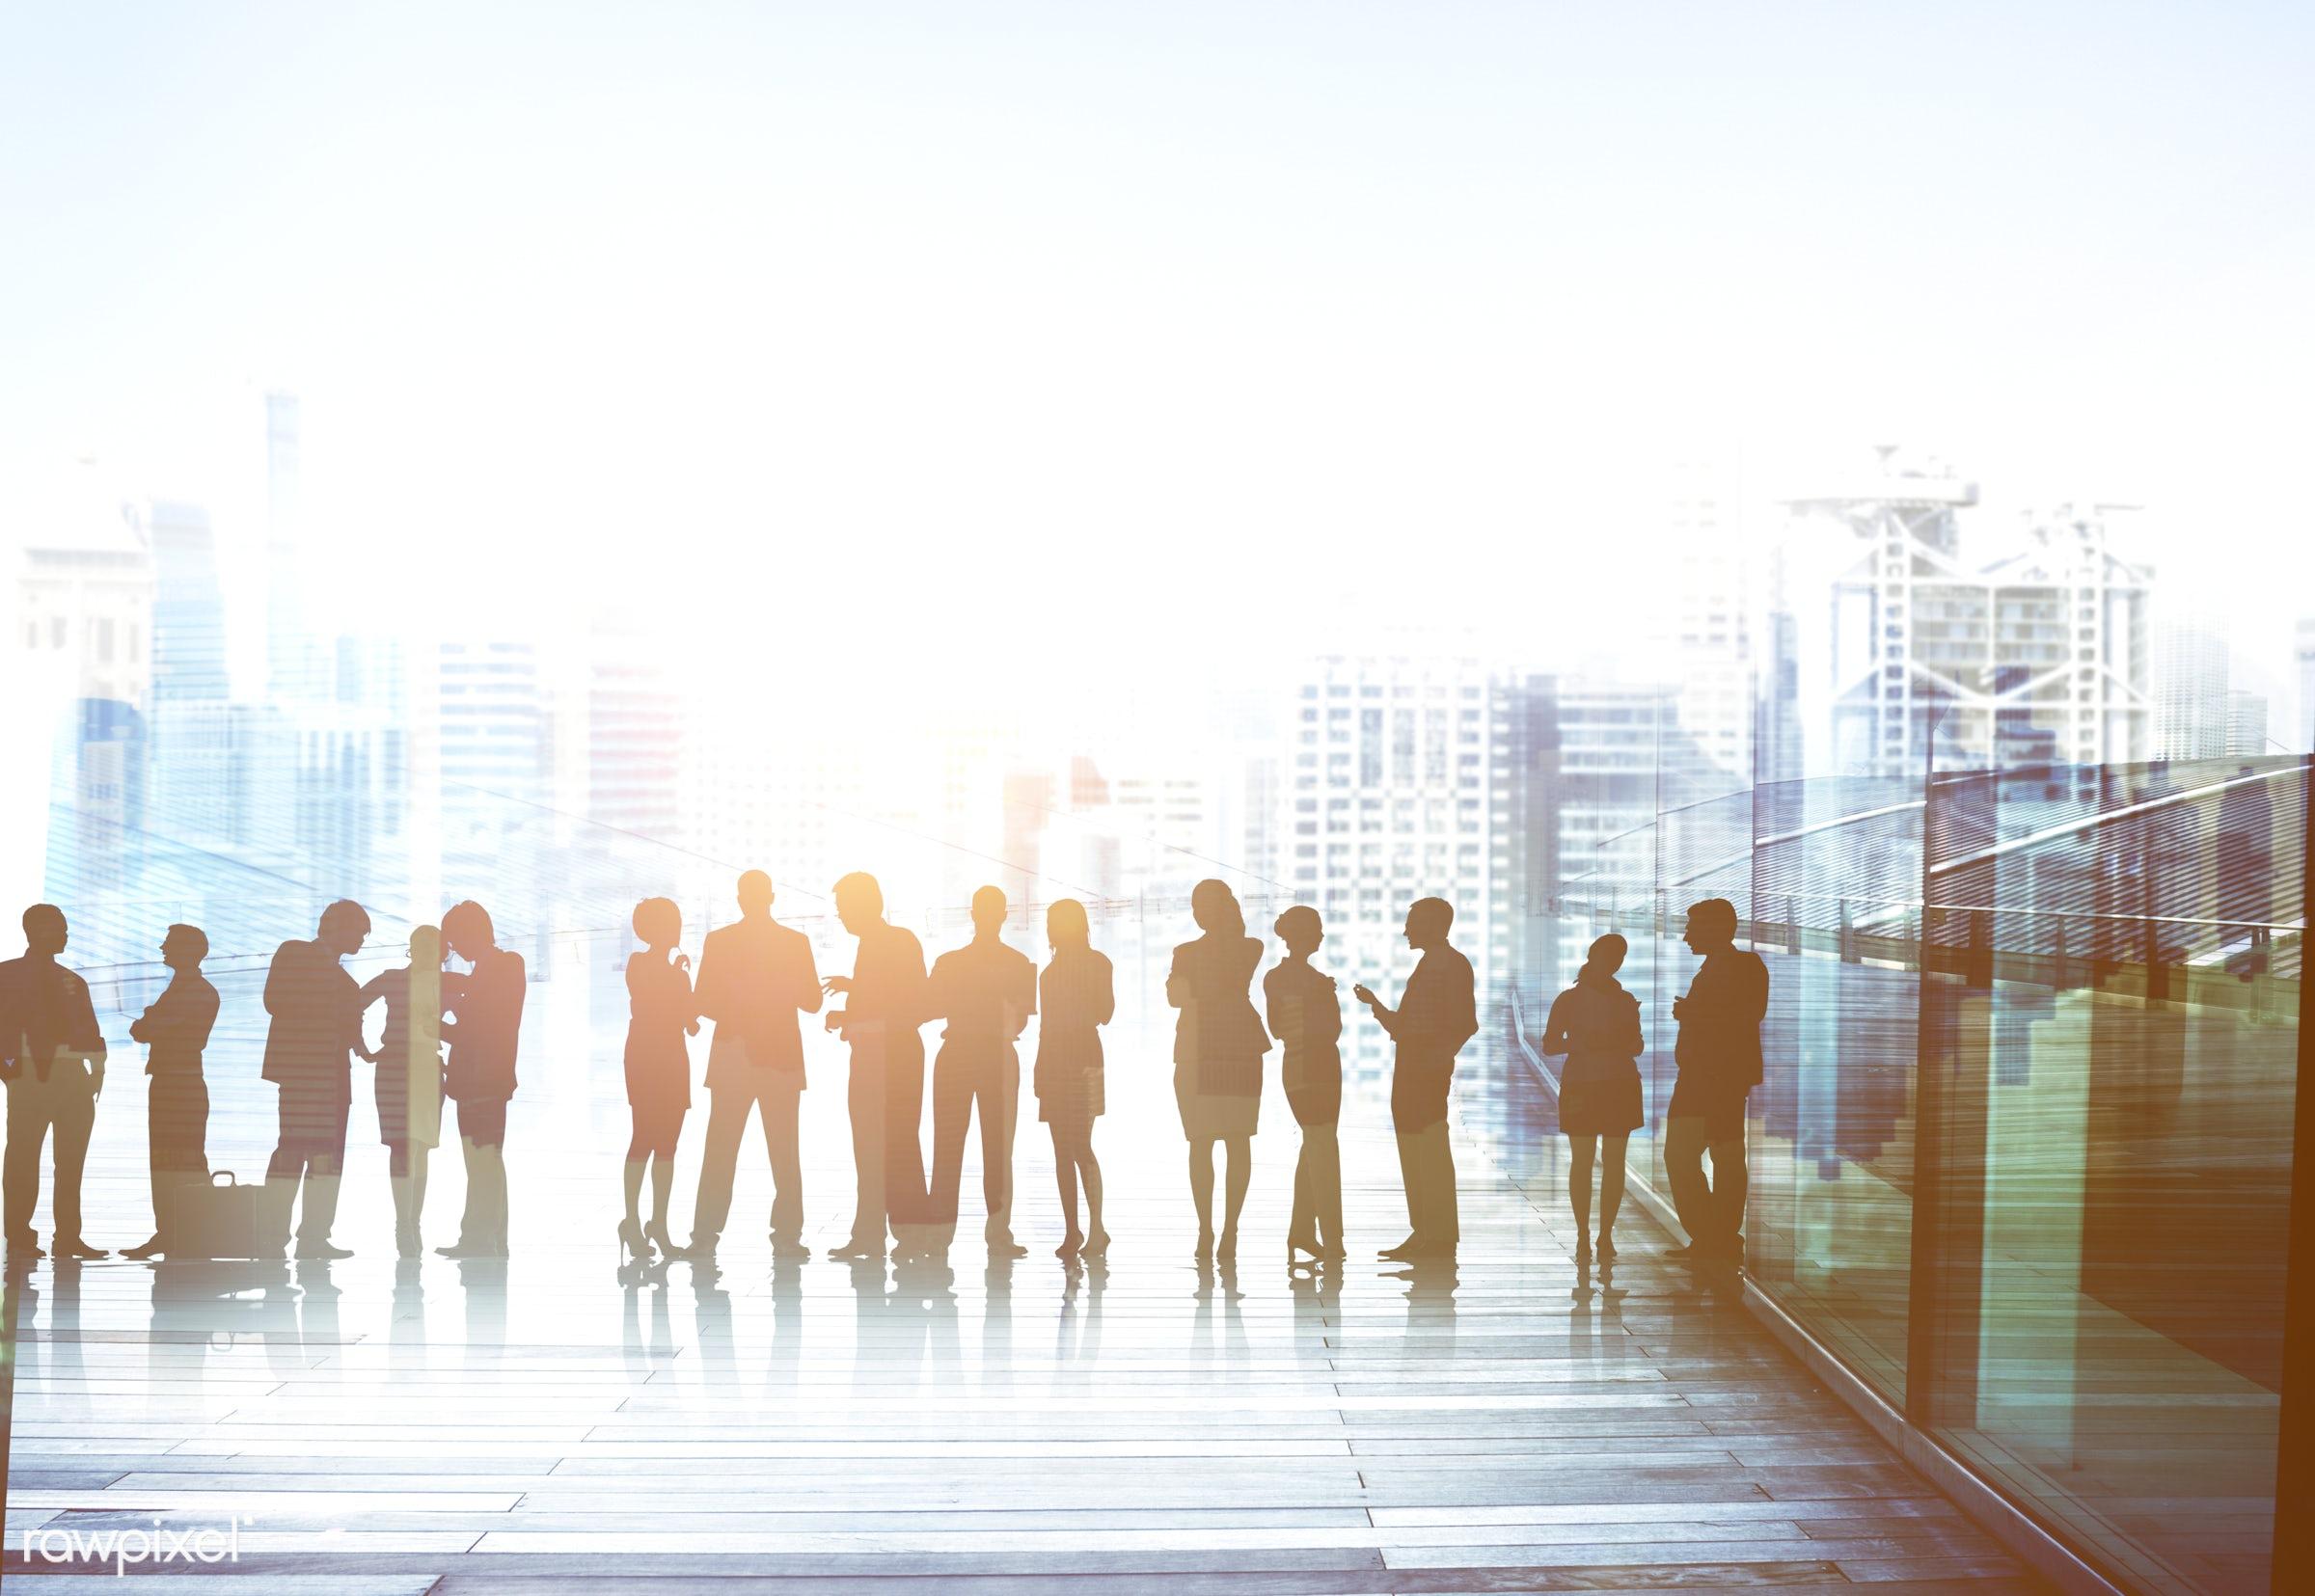 administration, brainstorming, building, business, business people, businessmen, businesswomen, city, city life, city light...